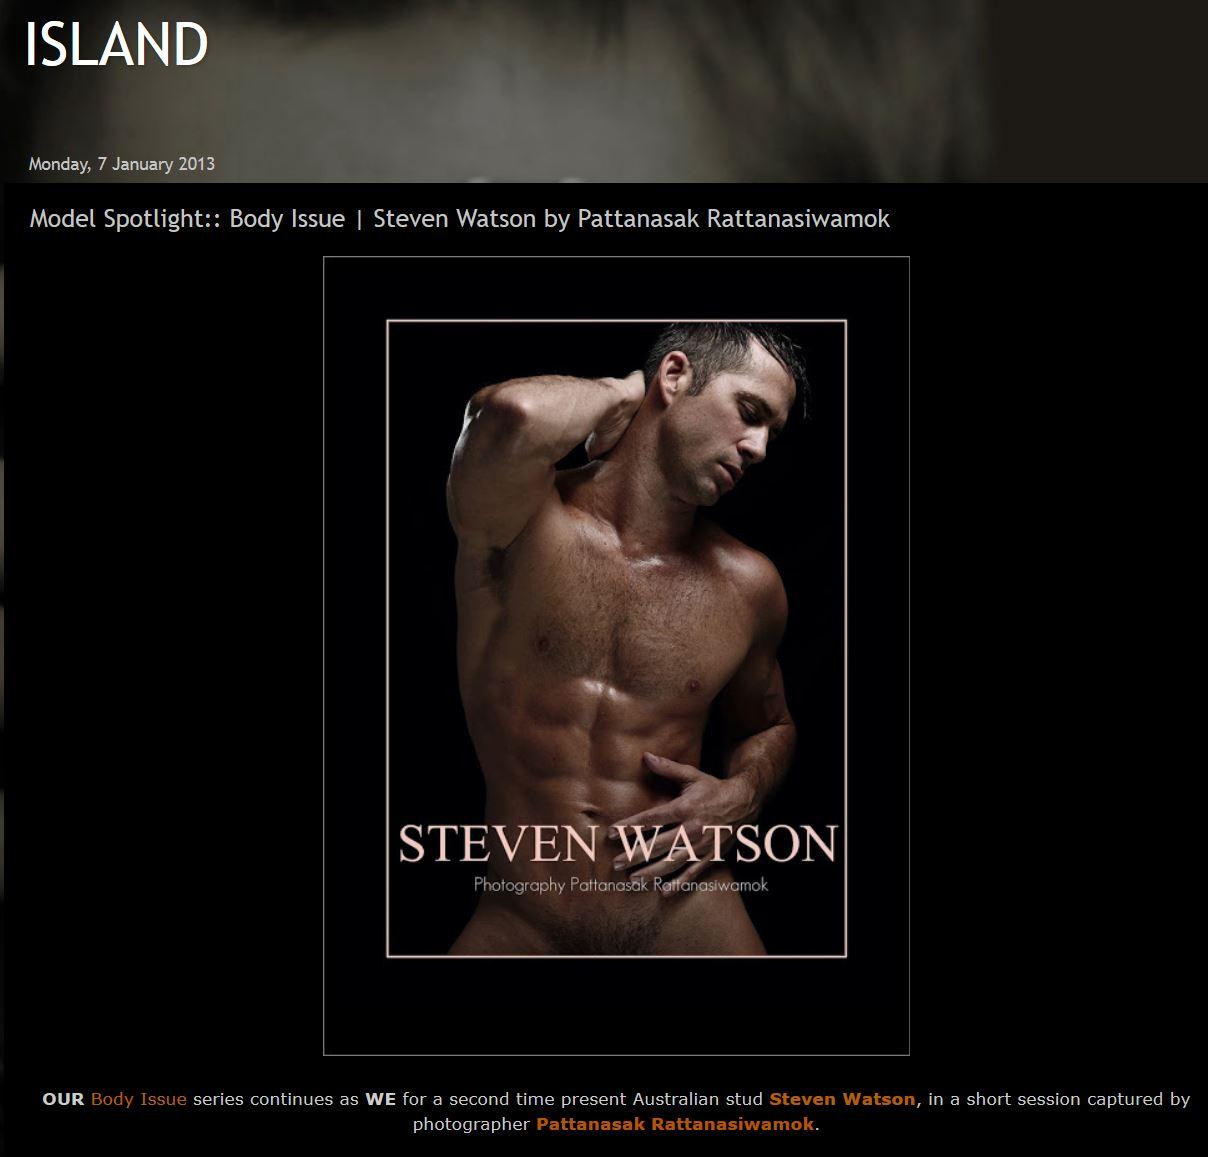 Steven Watson - Come to Island